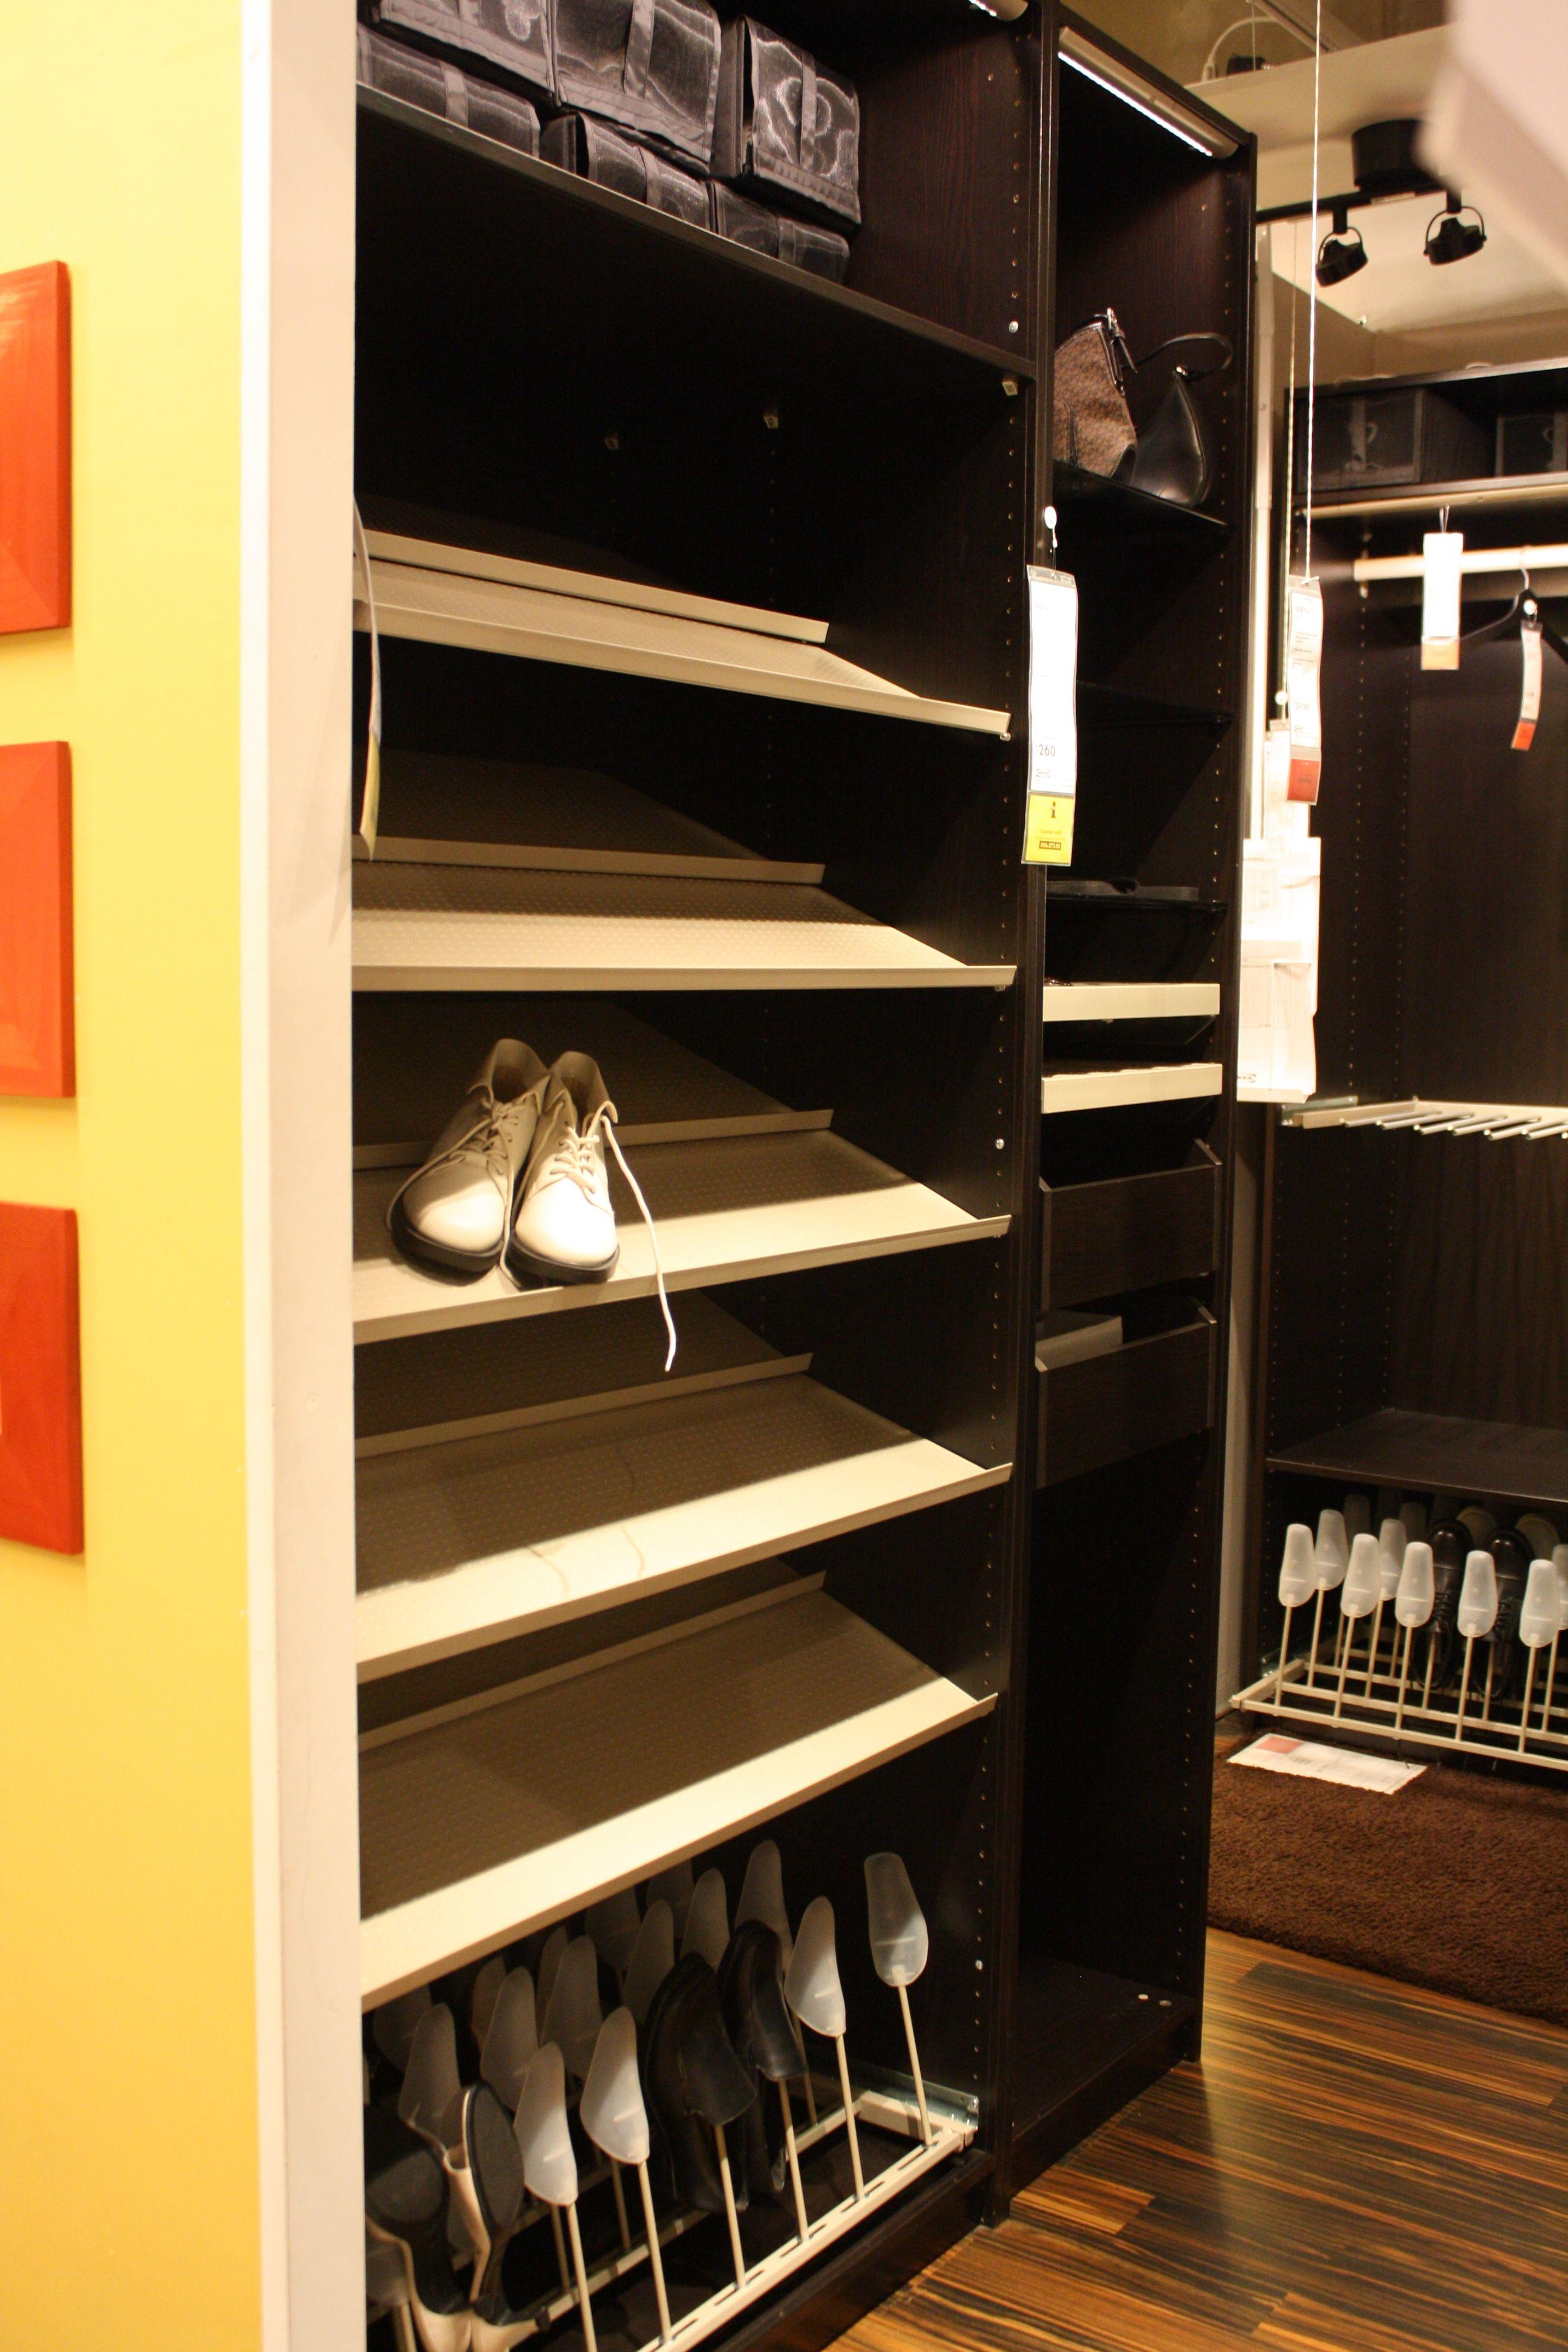 Ikea Closet organizer  For the Home  Pinterest